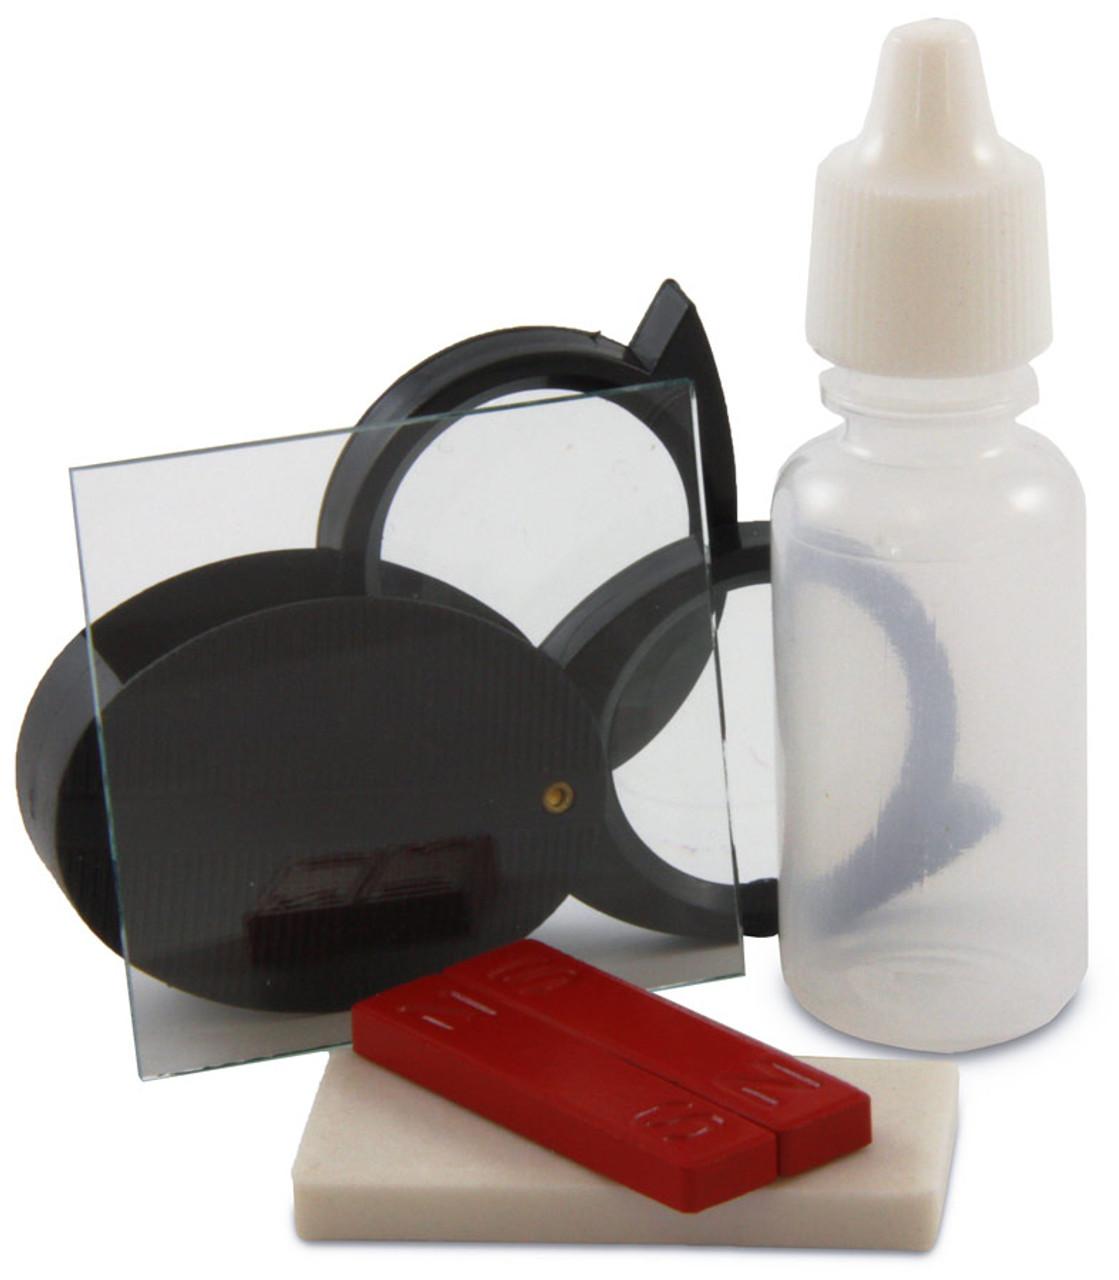 miura hardness test kit instructions